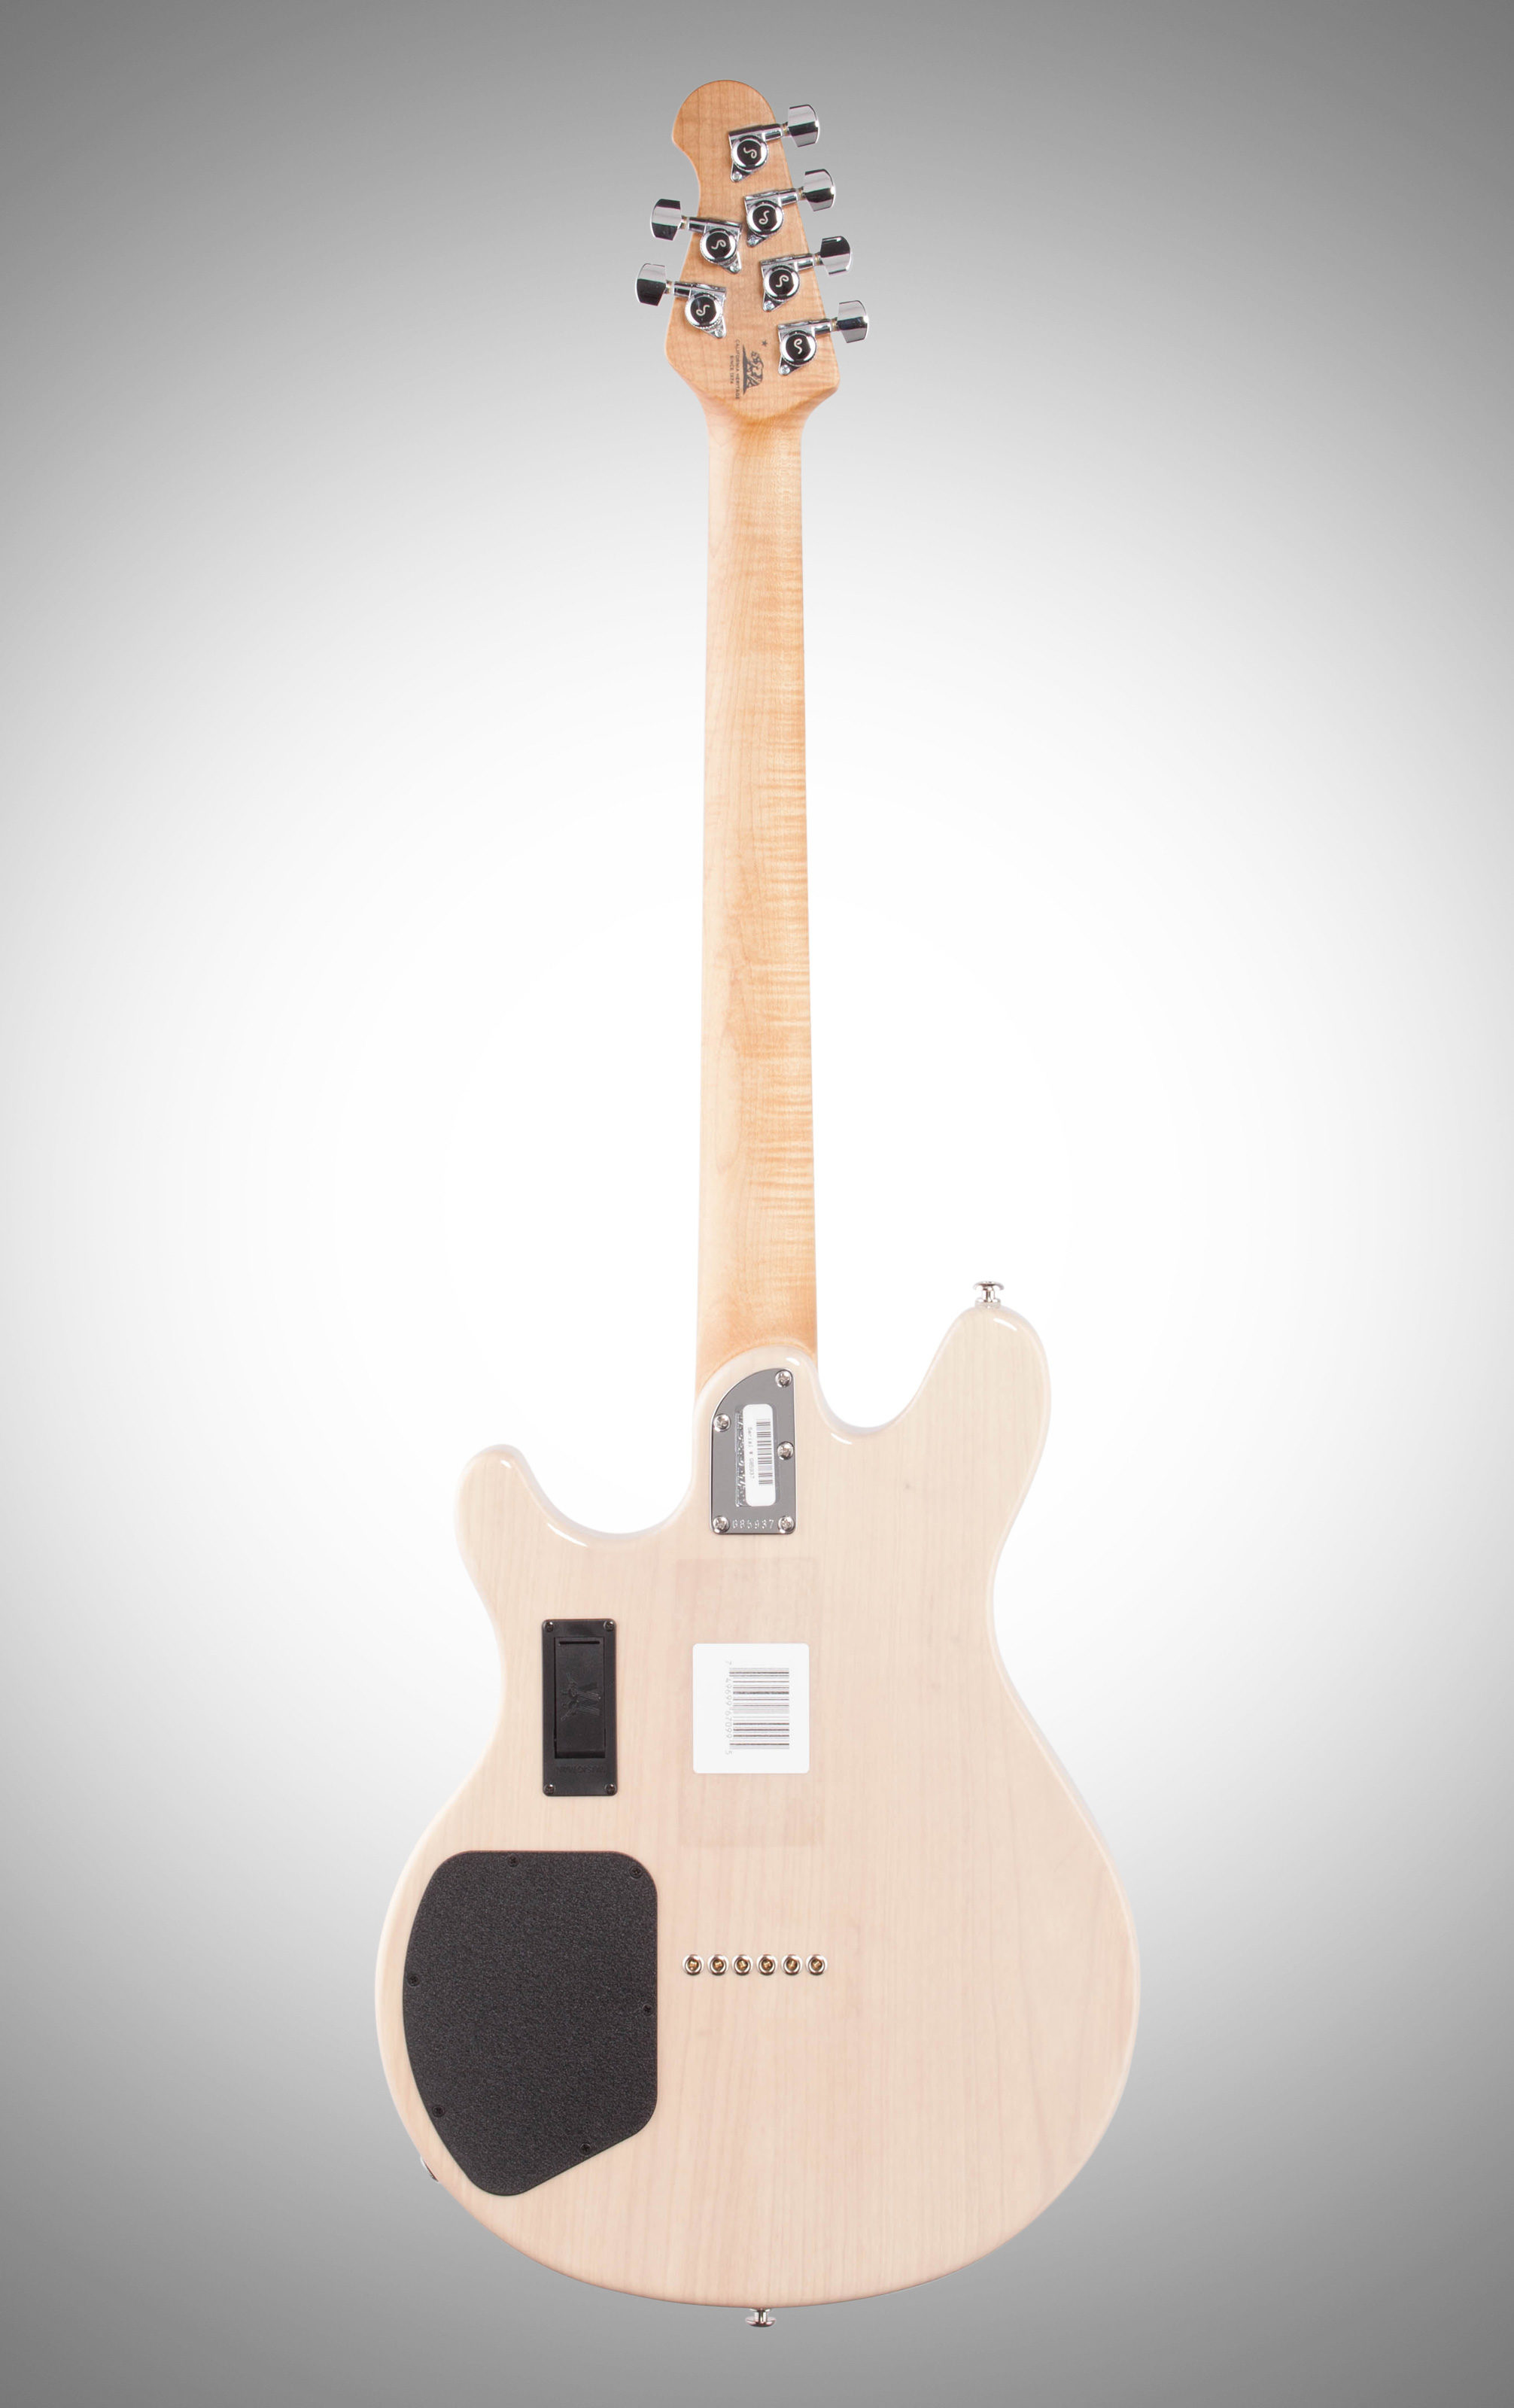 Ernie Ball Music Man Valentine Electric Guitar With Case